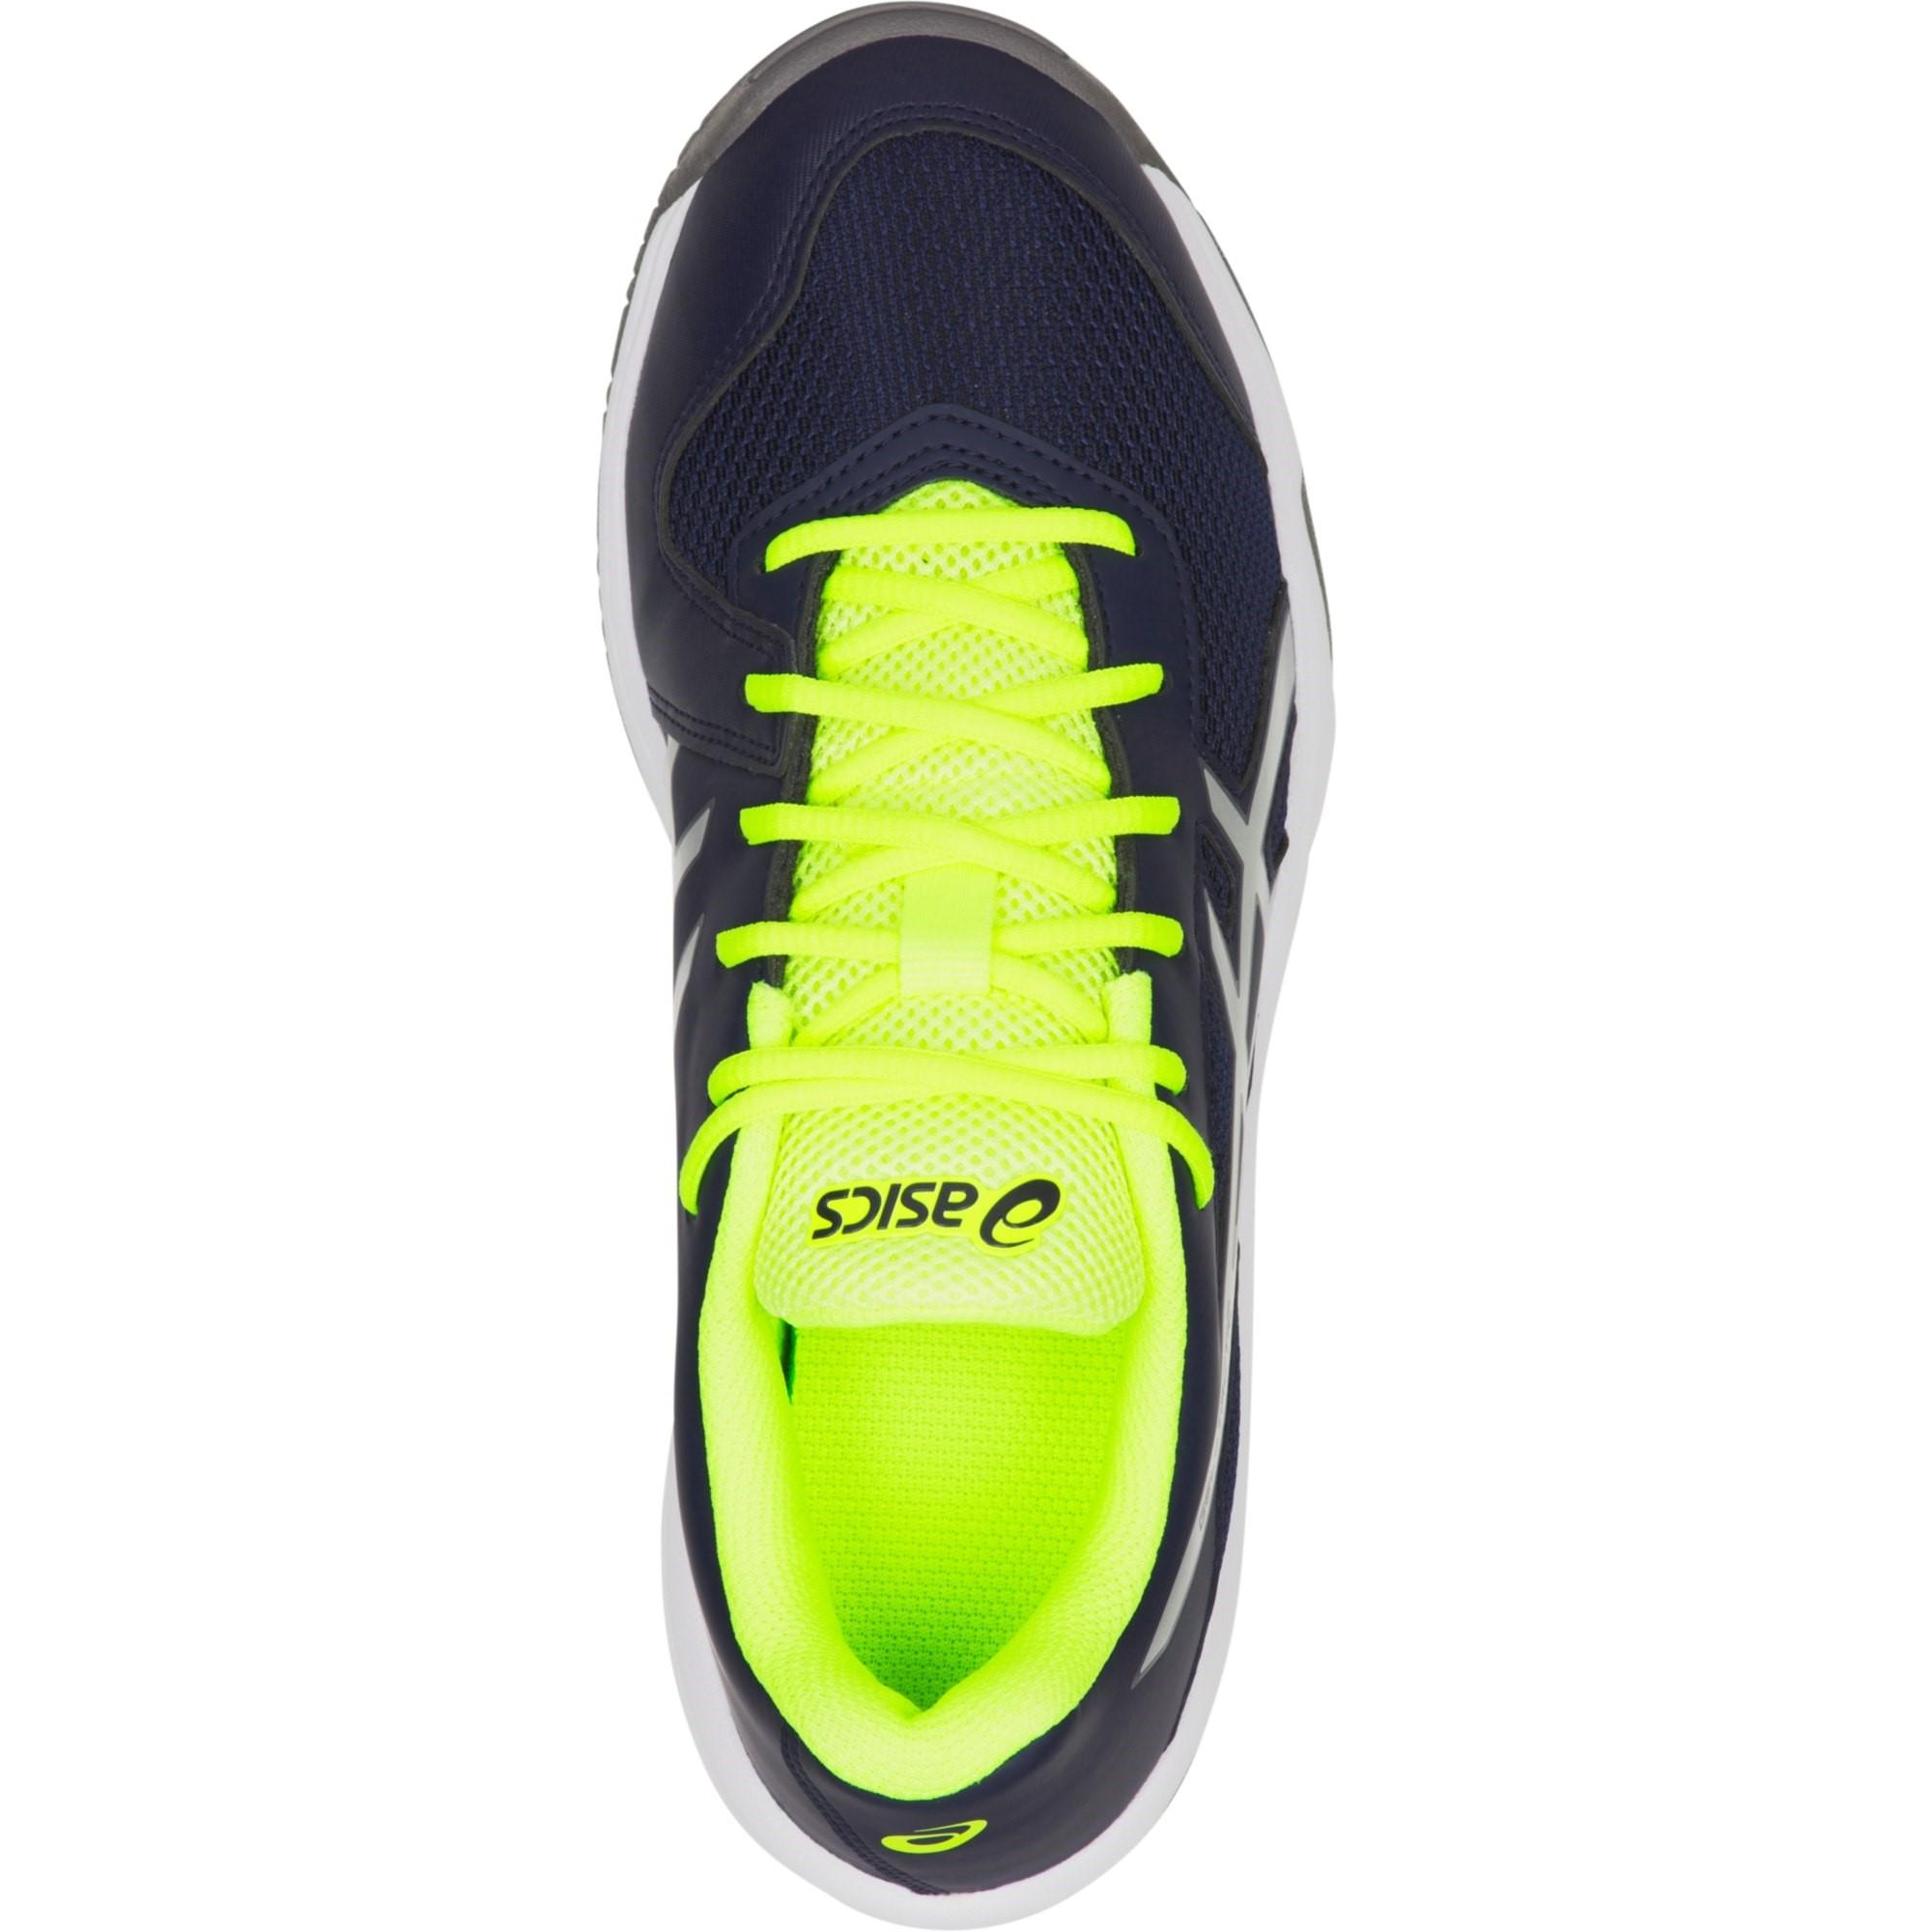 ef84cd53d Asics Kids GEL-Tactic Indoor Court Shoes - Peacoat/Silver ...